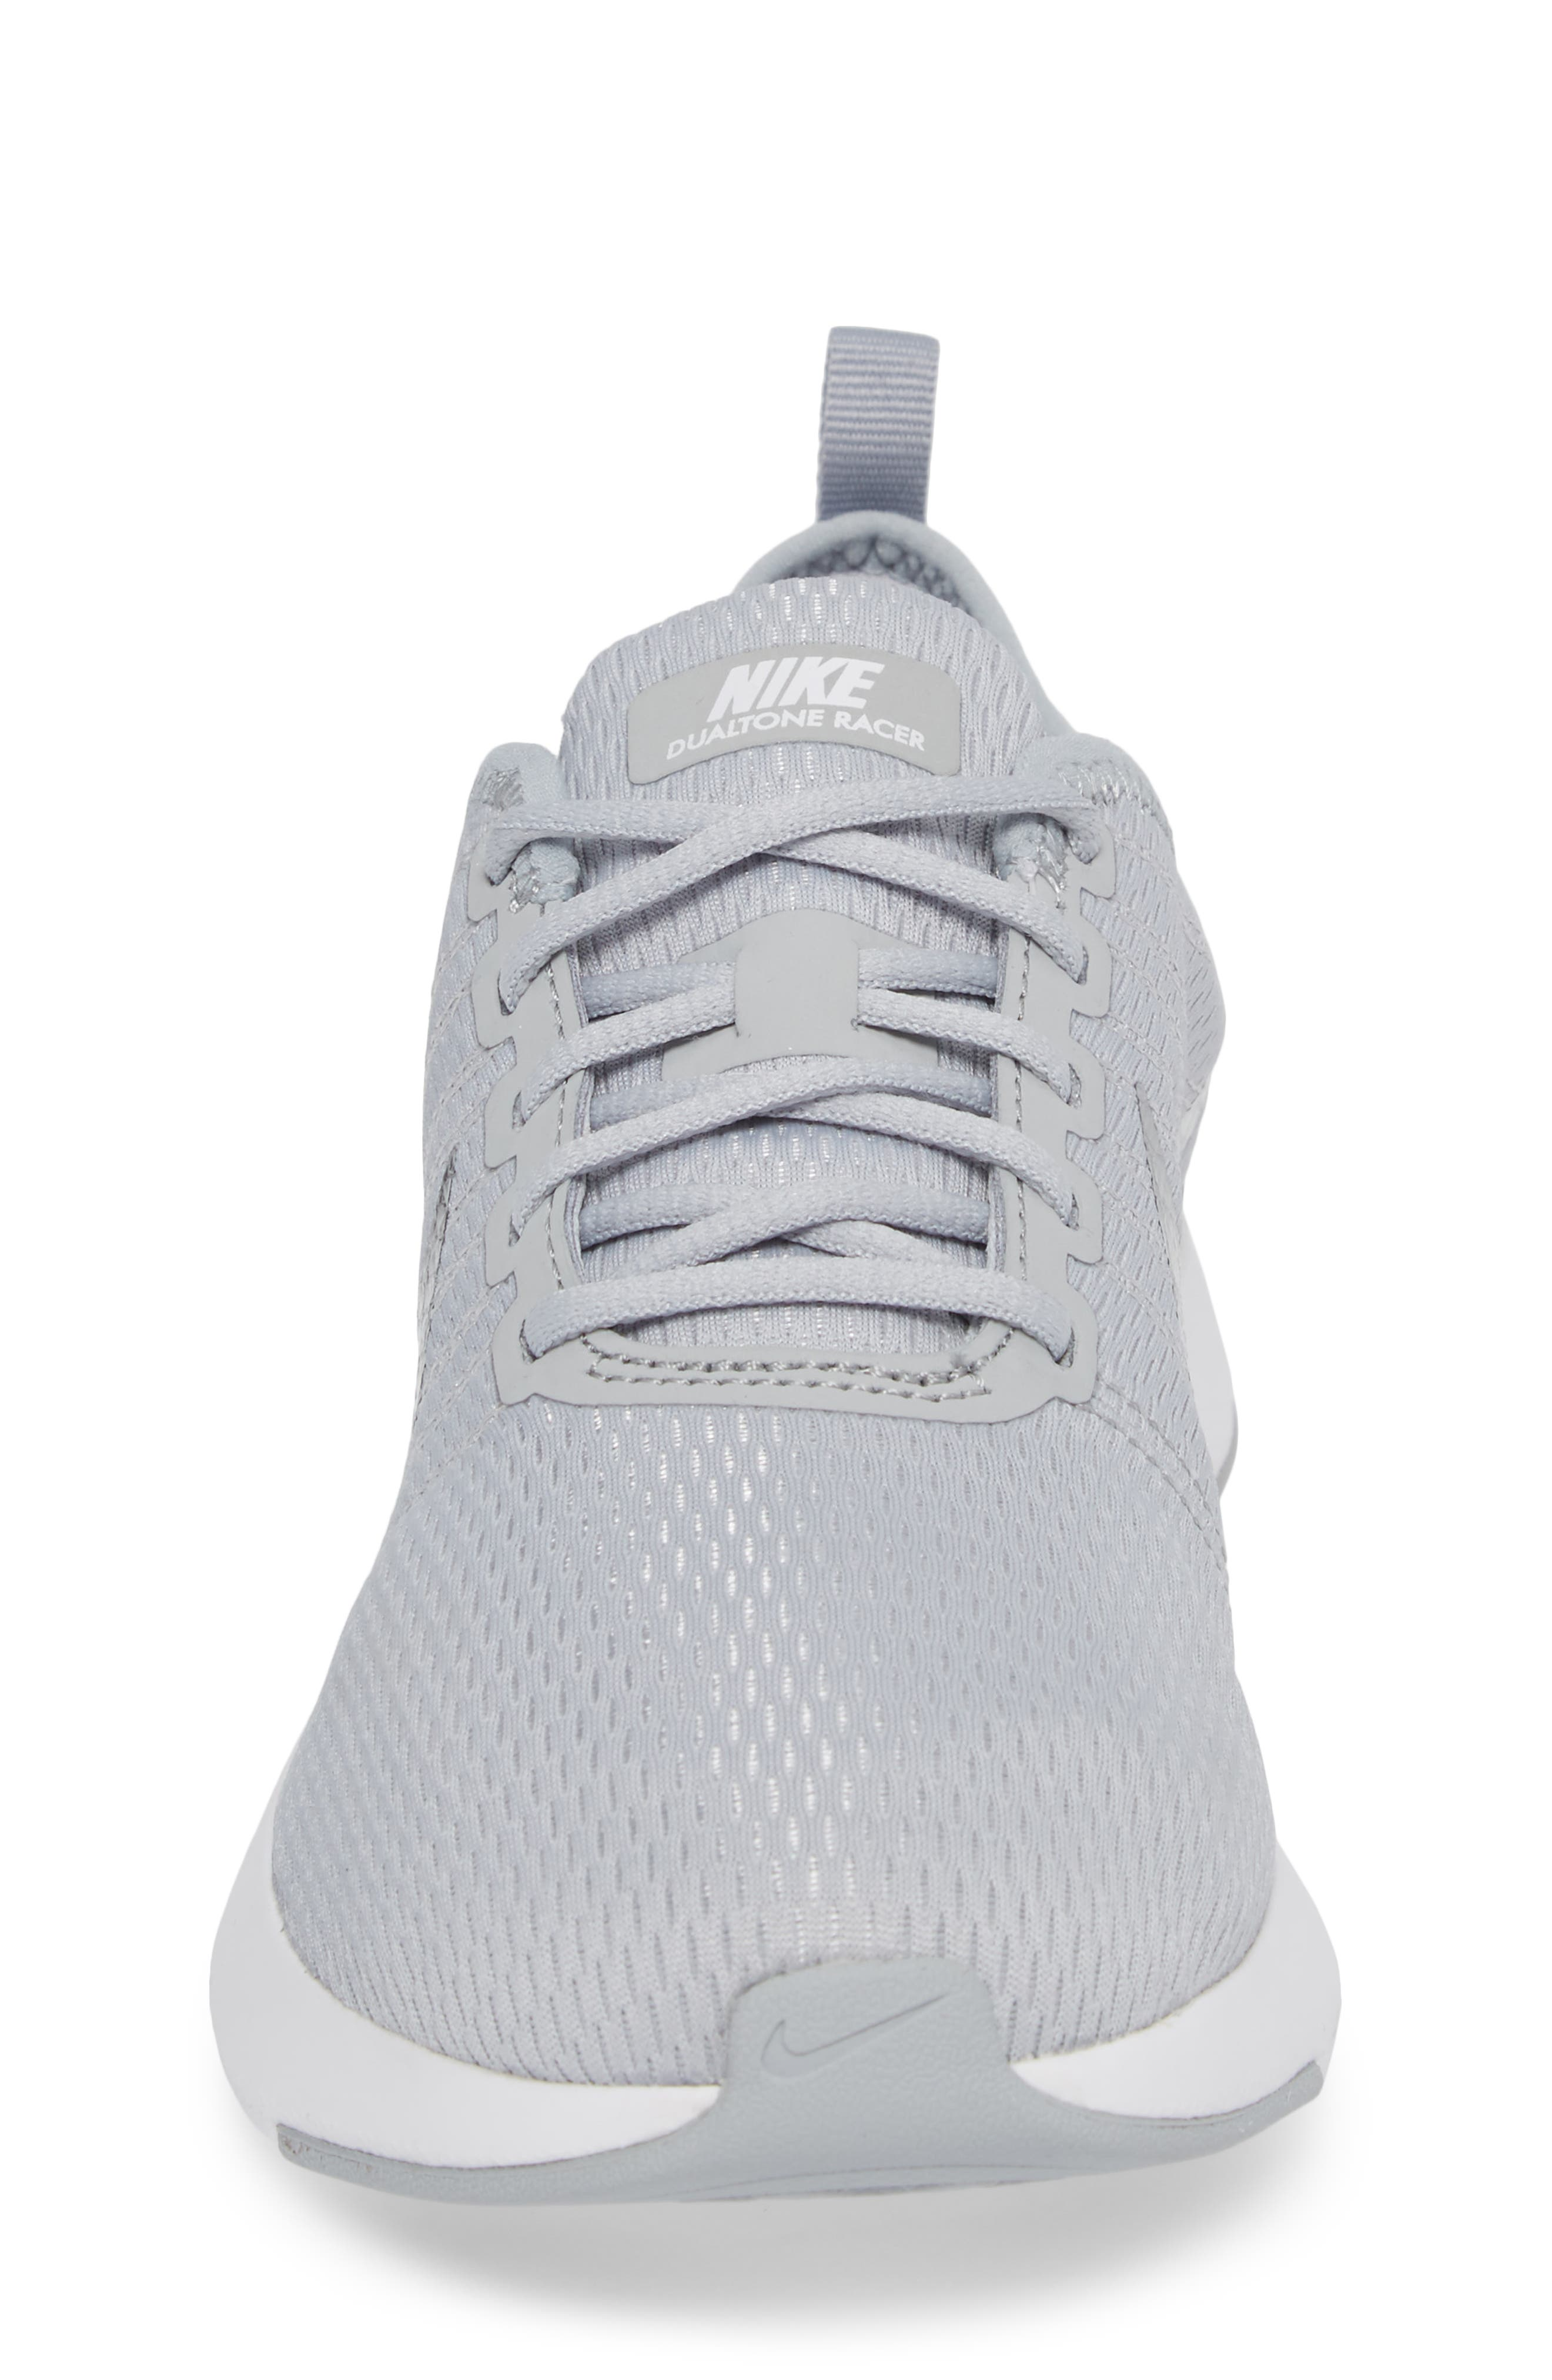 Dualtone Racer GS Sneaker,                             Alternate thumbnail 4, color,                             Wolf Grey/ Metallic Silver